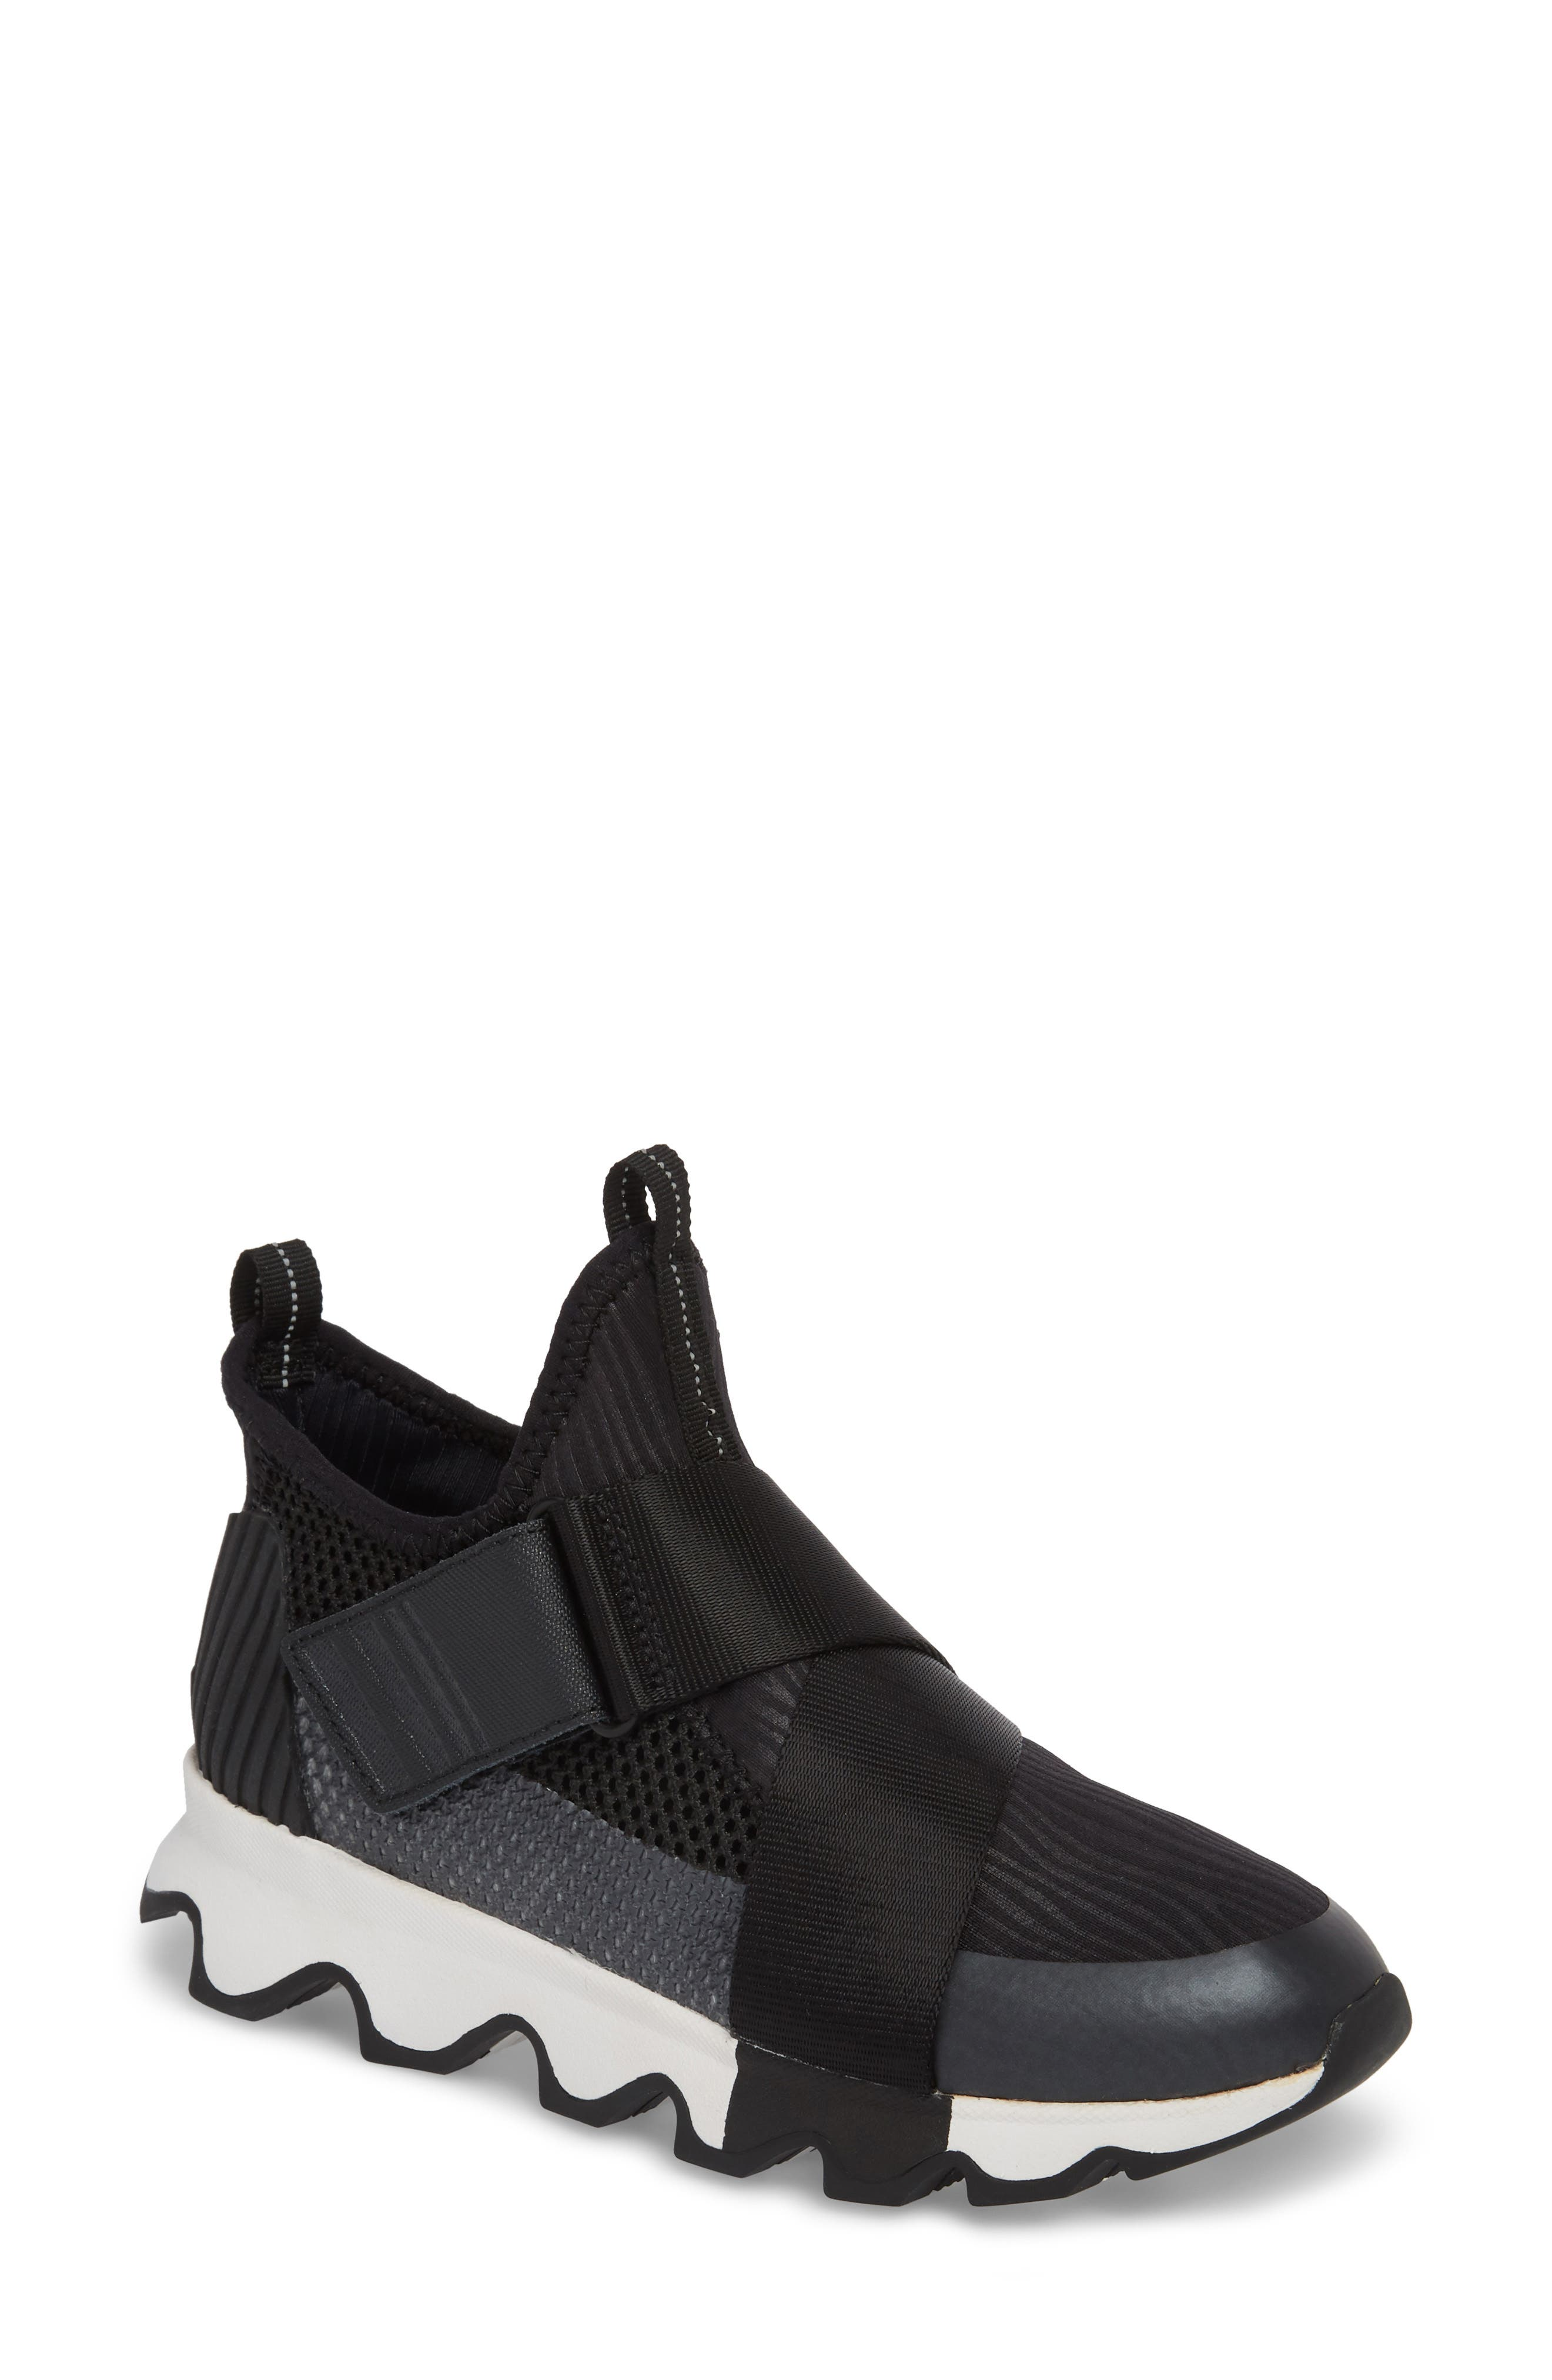 Sorel Kinetic Sneak High Top Sneaker, Black